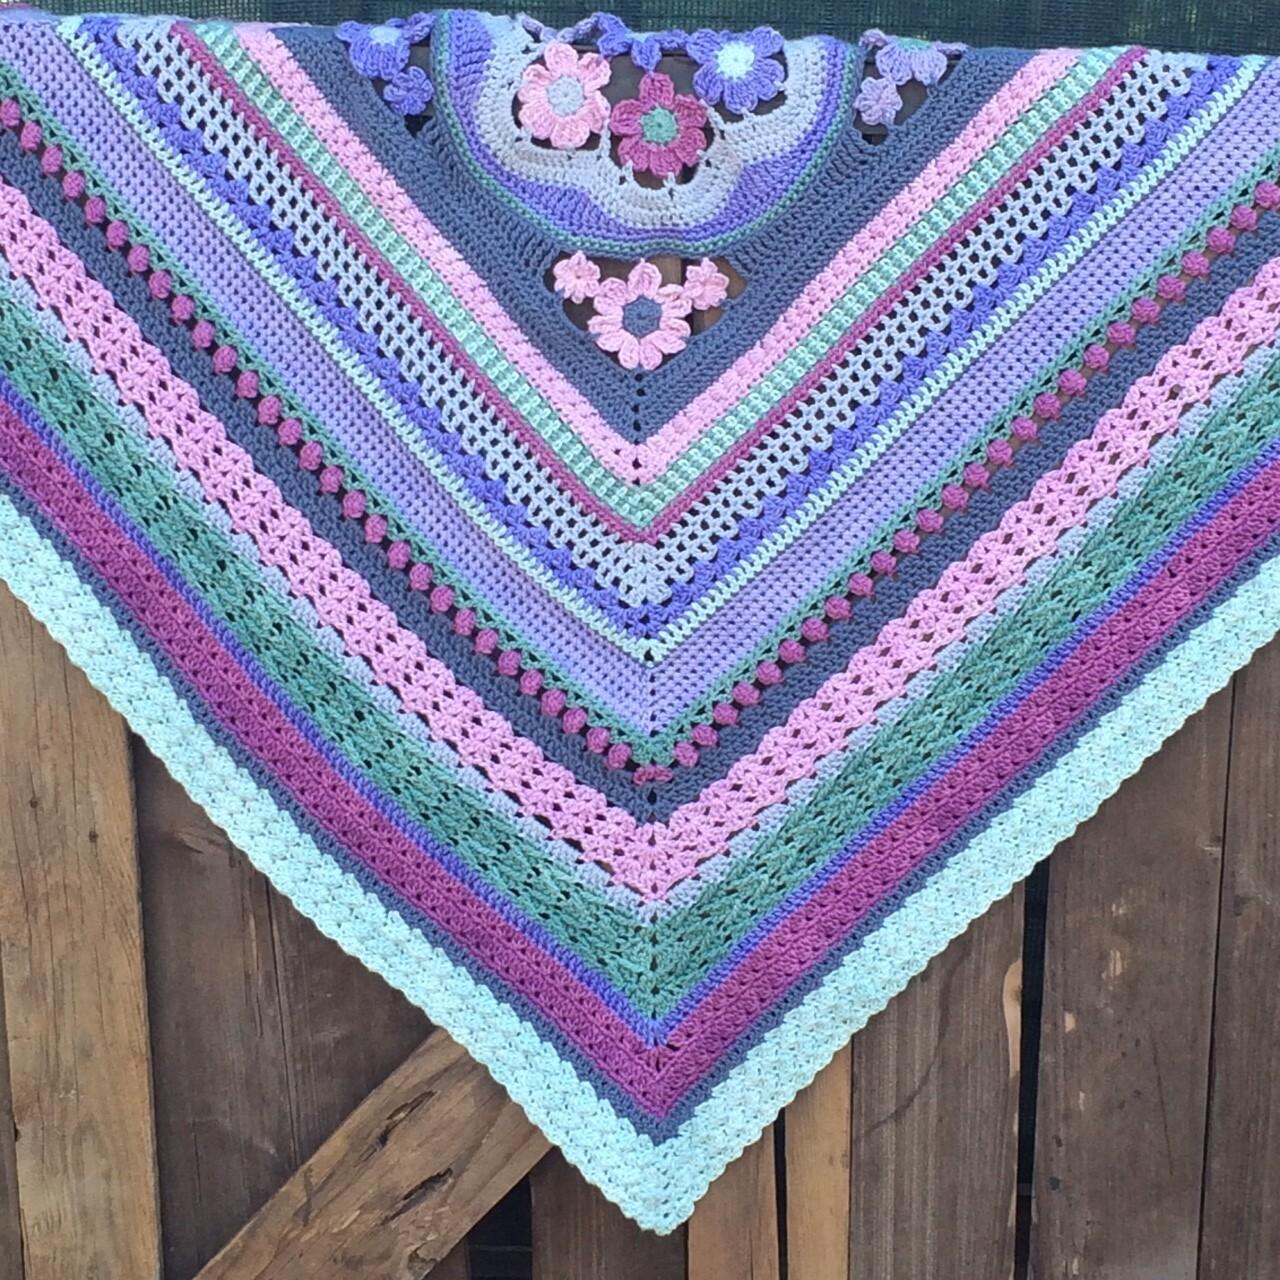 Hilda Steyn's Lover of my Soul Crochet Kit